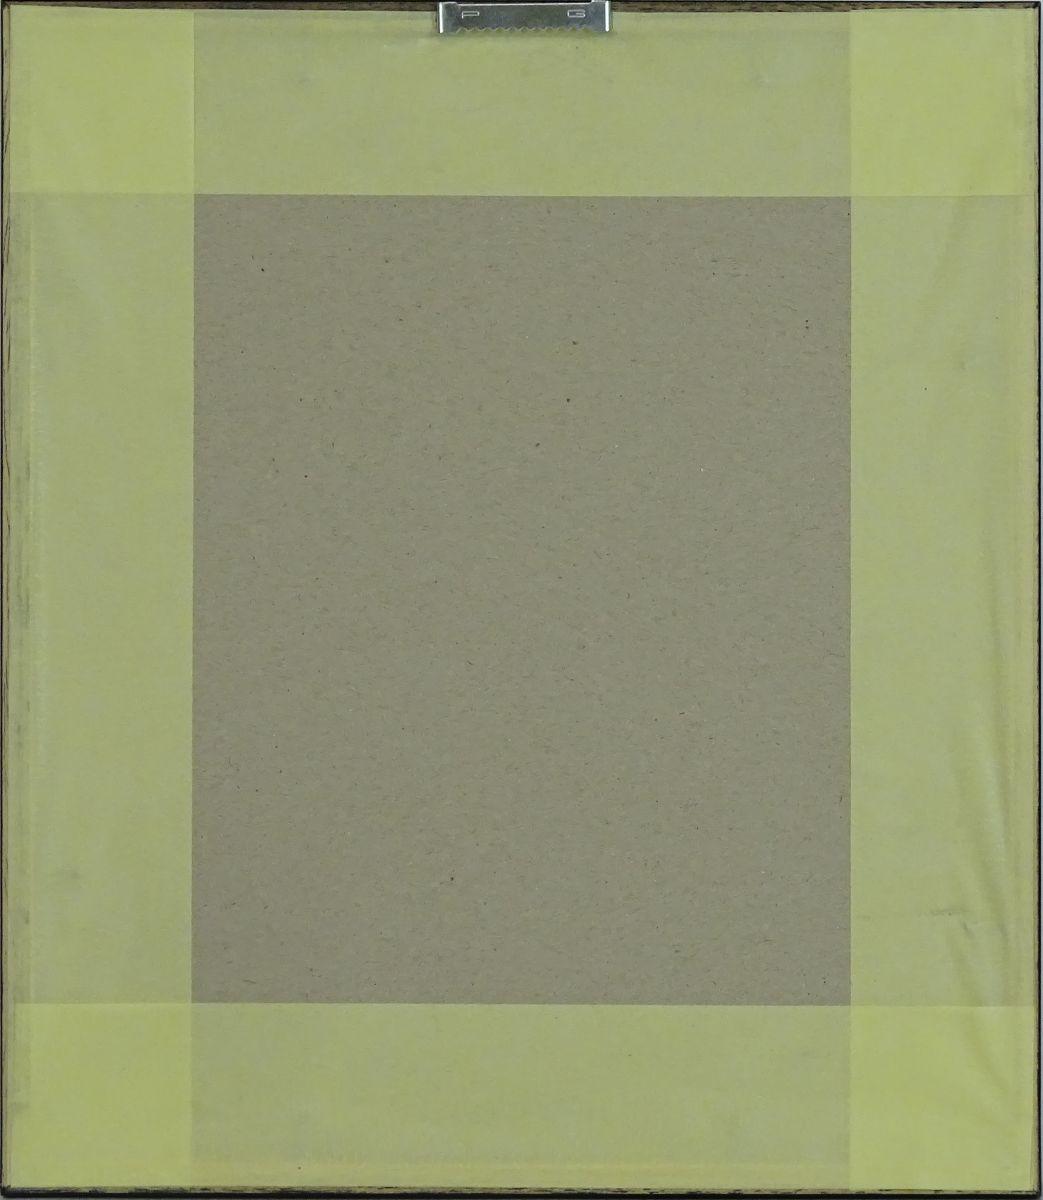 DSC06673.JPG (1043×1200)